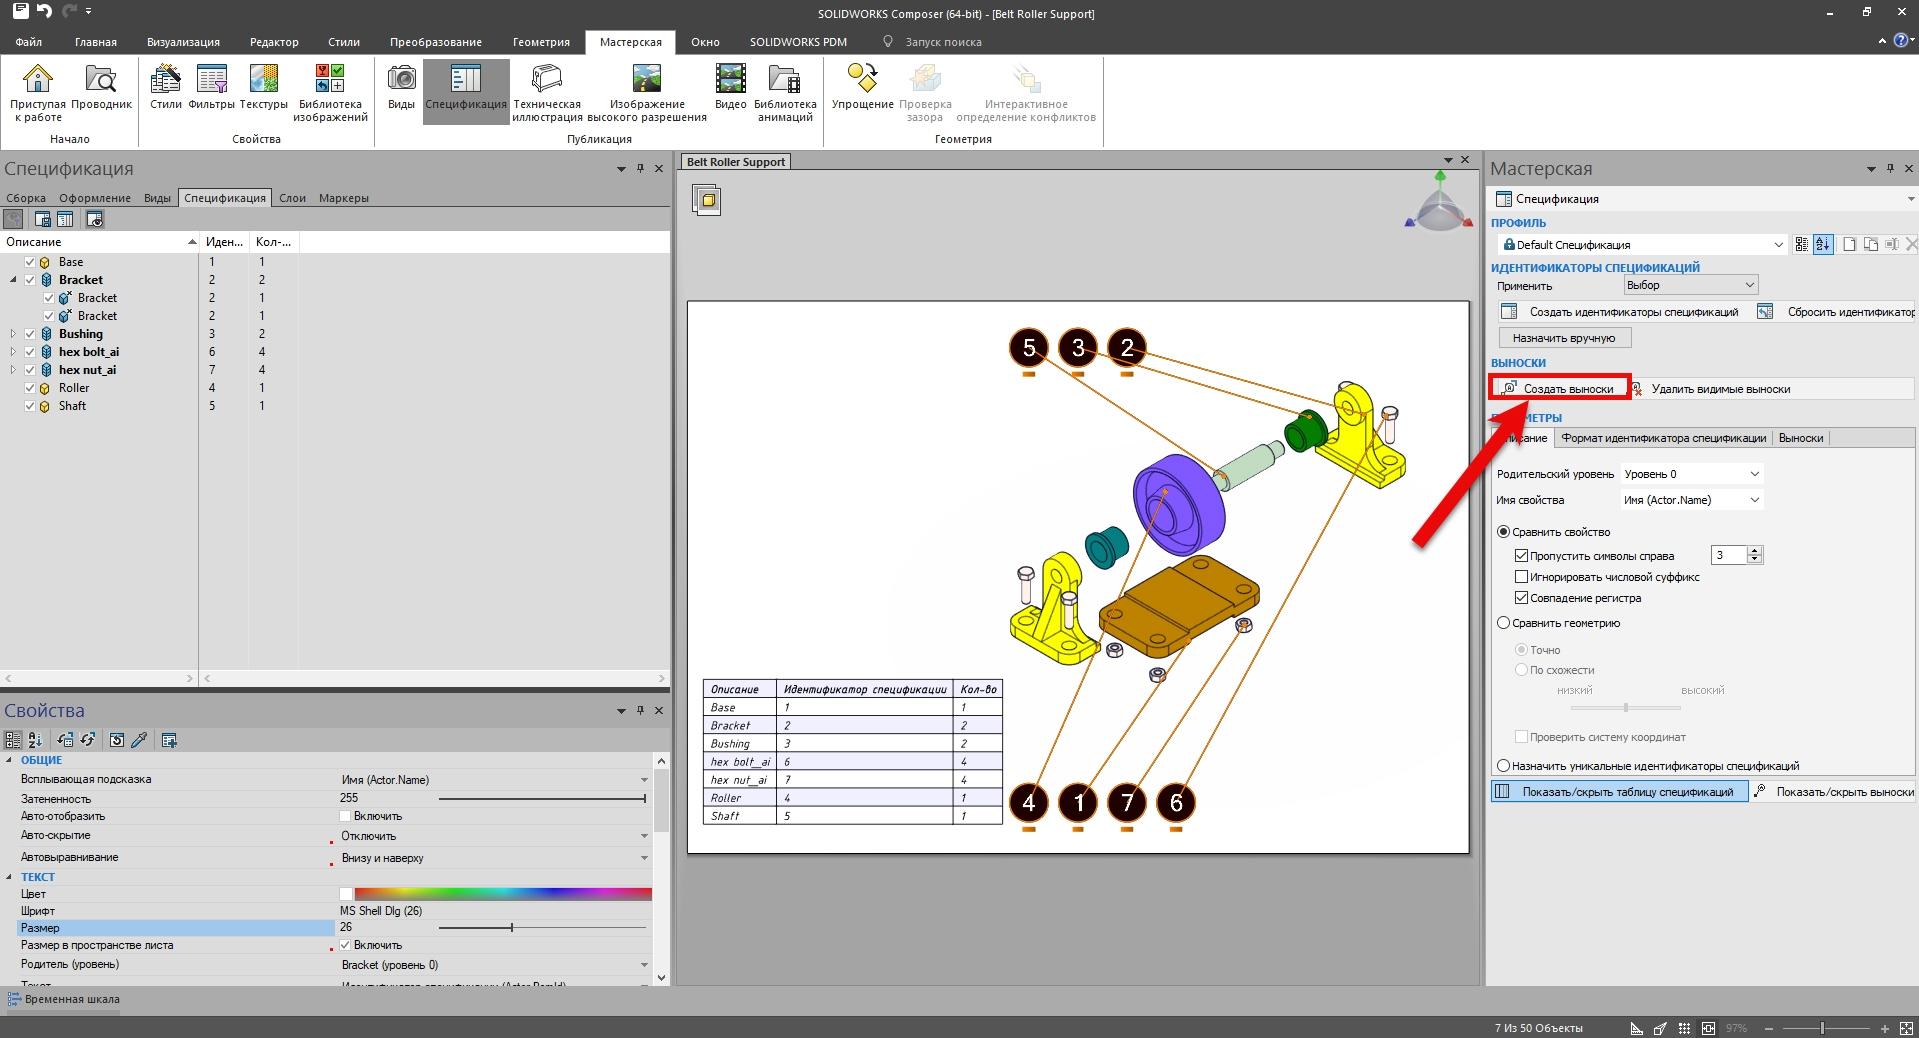 SOLIDWORKS Composer: Спецификация, SolidWorks Composer, composer, спецификация, SolidWorks спецификация